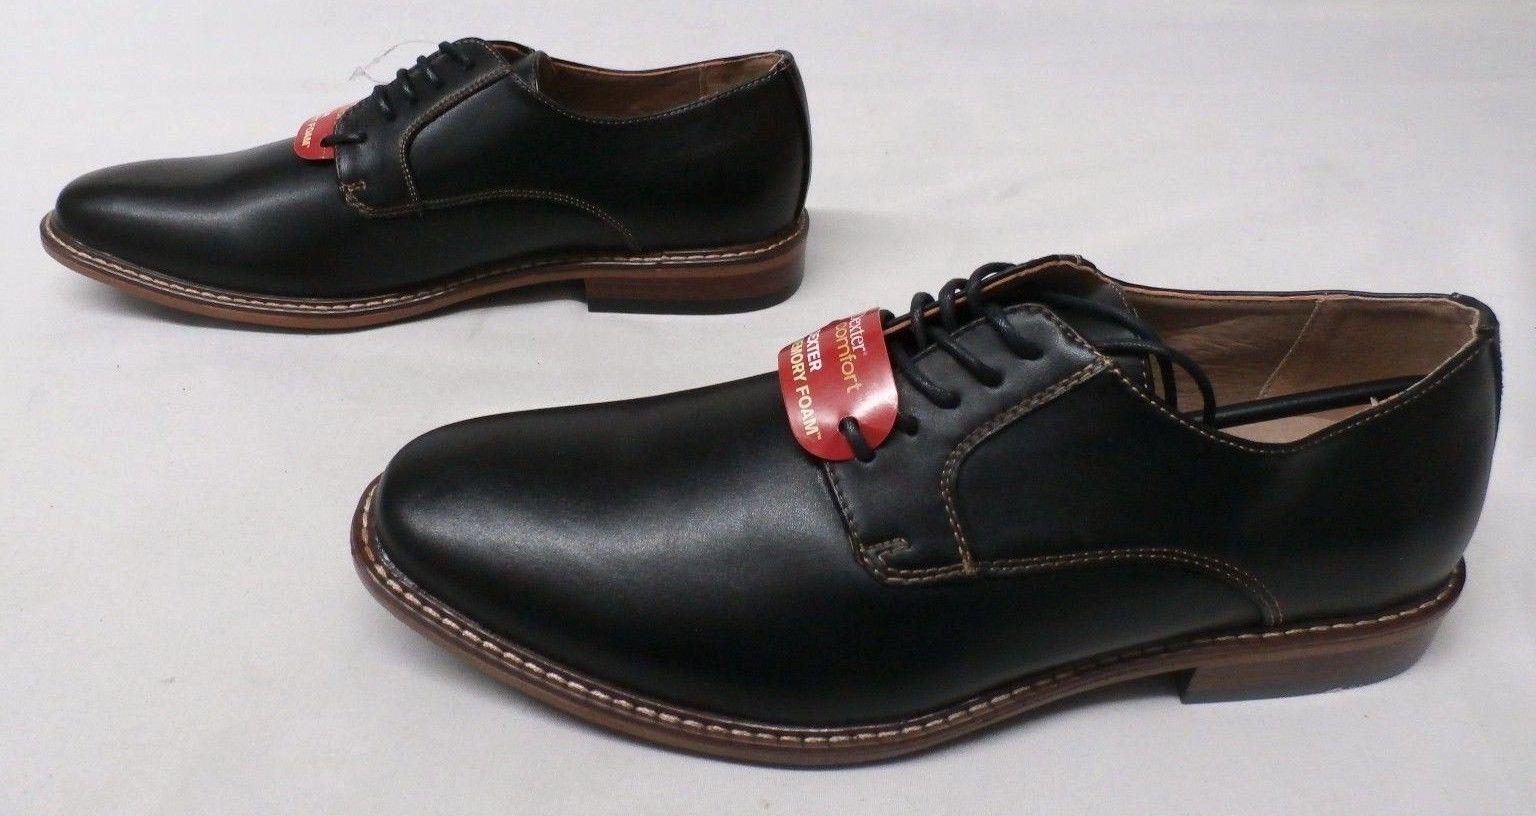 f5497cf9f7a415 Dexter Men s Alec Plain-Toe Oxford Shoes Black GG8 Size 9